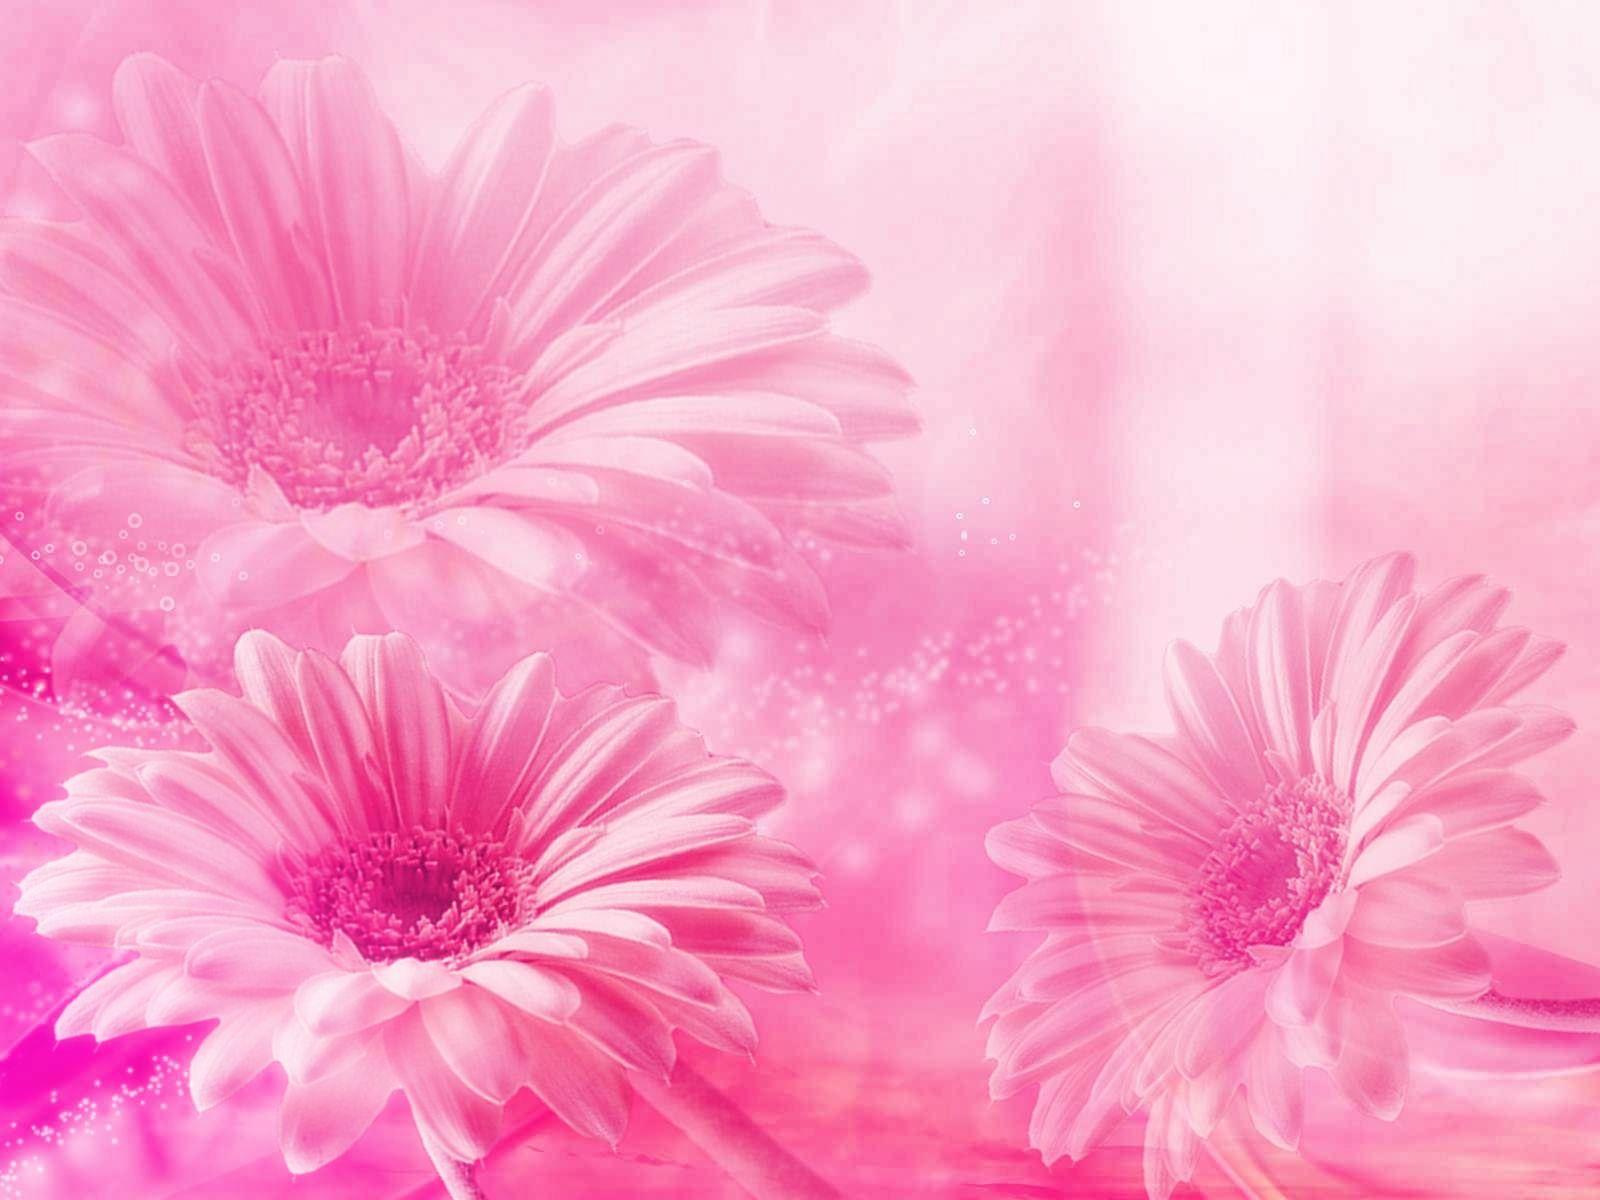 Wallpapers Flowers,fondos Flores Colores Pasteles